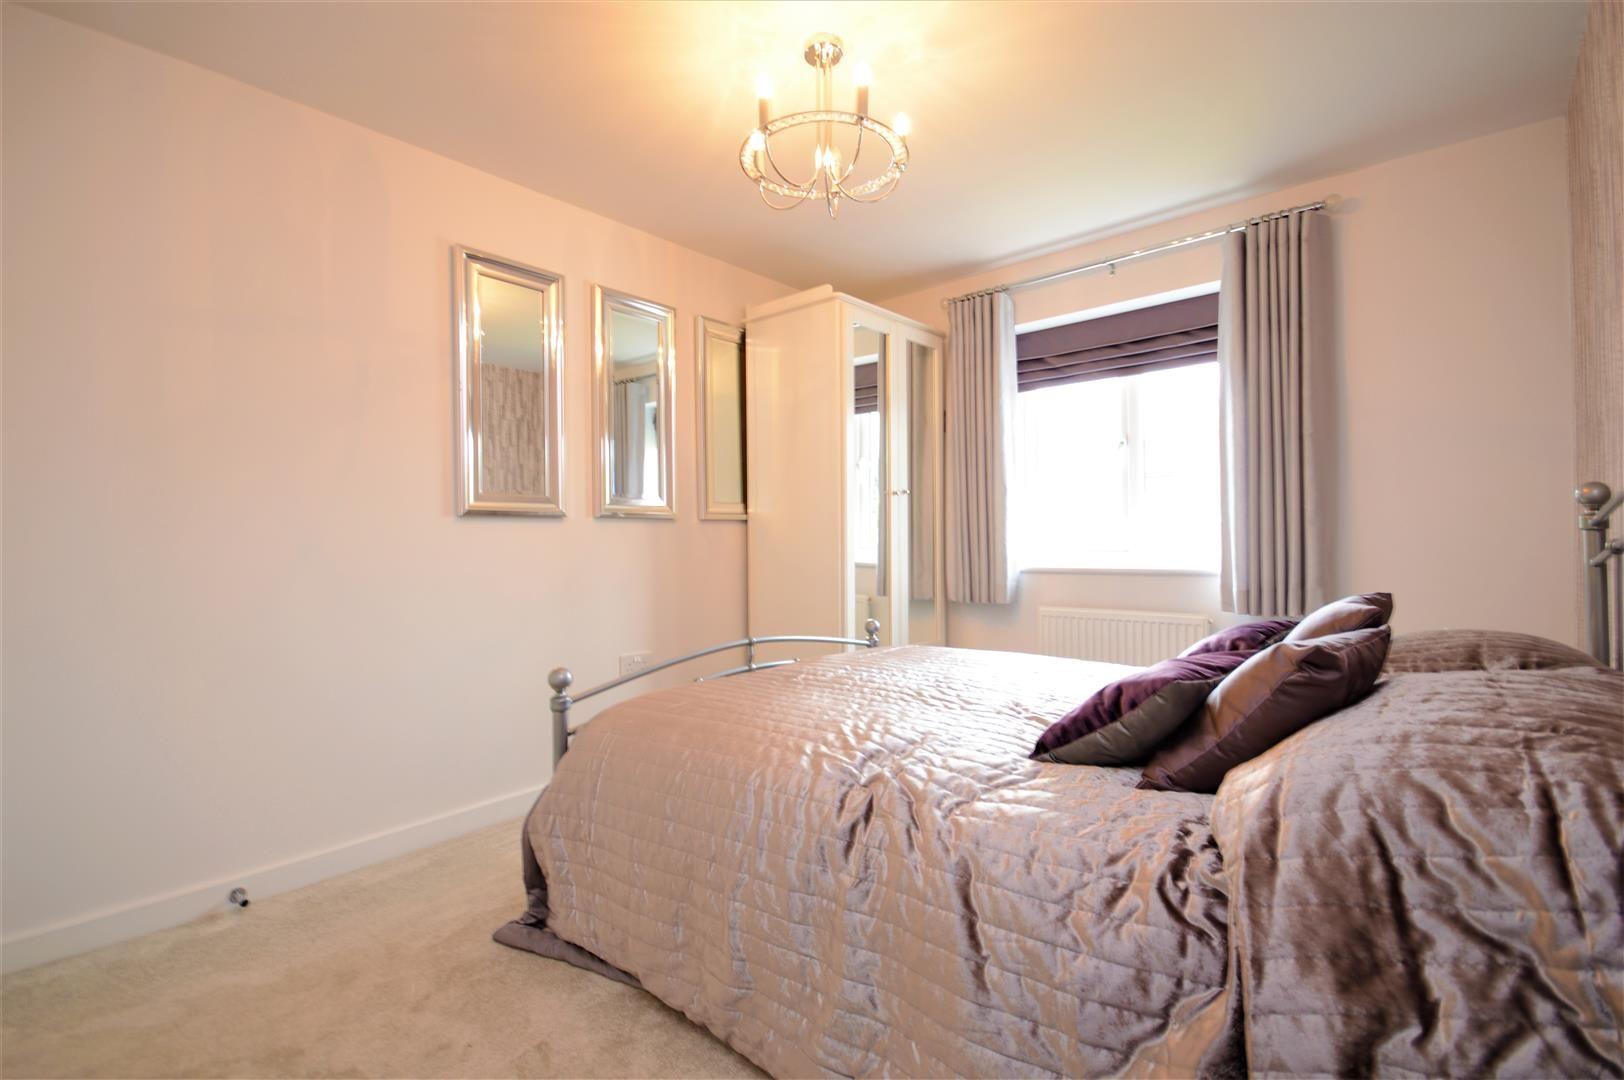 4 bed detached for sale in Bartestree  - Property Image 13